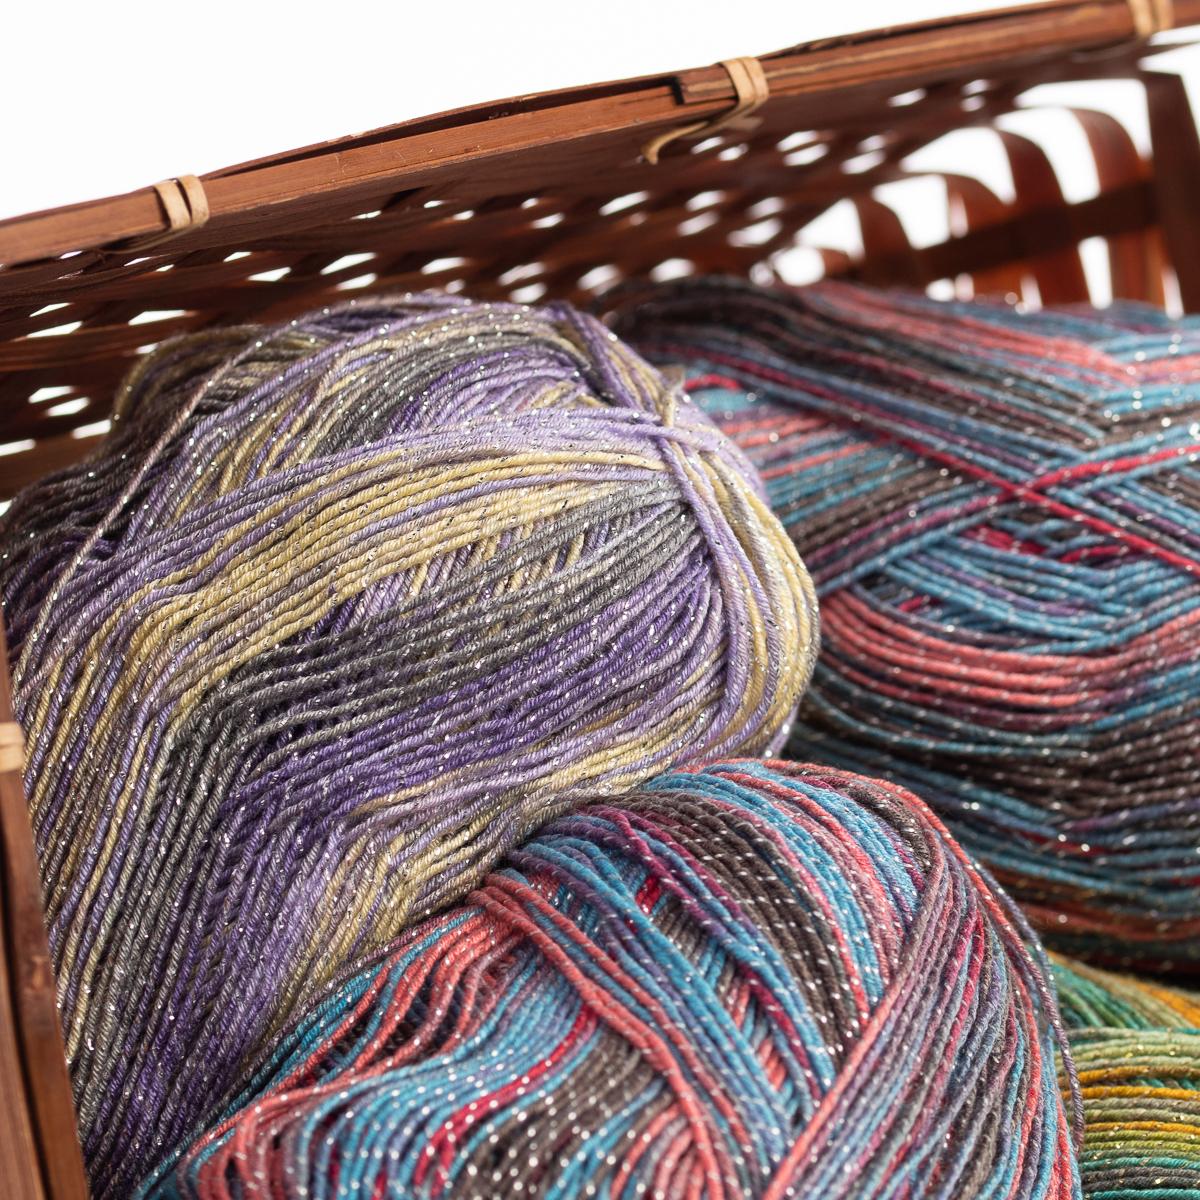 3pk-Premier-Yarns-Wool-Free-Lace-Acrylic-Yarn-Super-Fine-1-Knitting-Skeins-Soft thumbnail 11